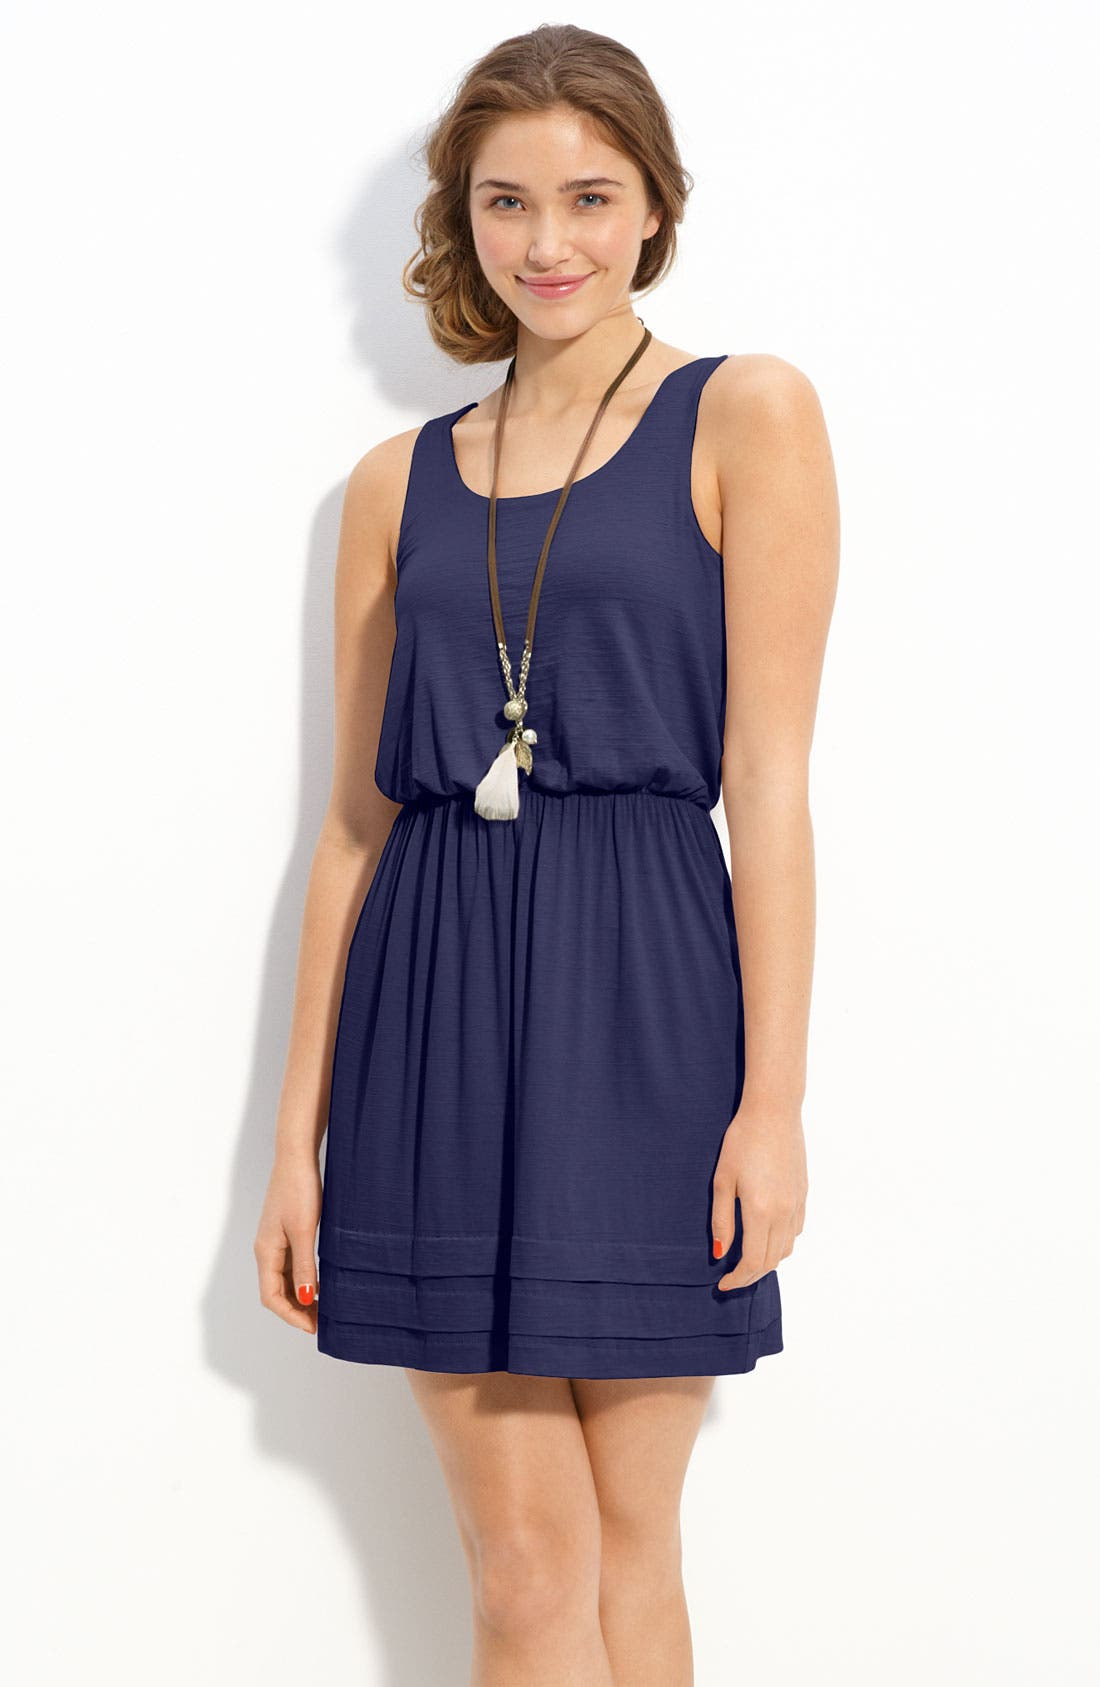 Alternate Image 1 Selected - Lush Pleated Hem Slub Knit Tank Dress (Juniors)